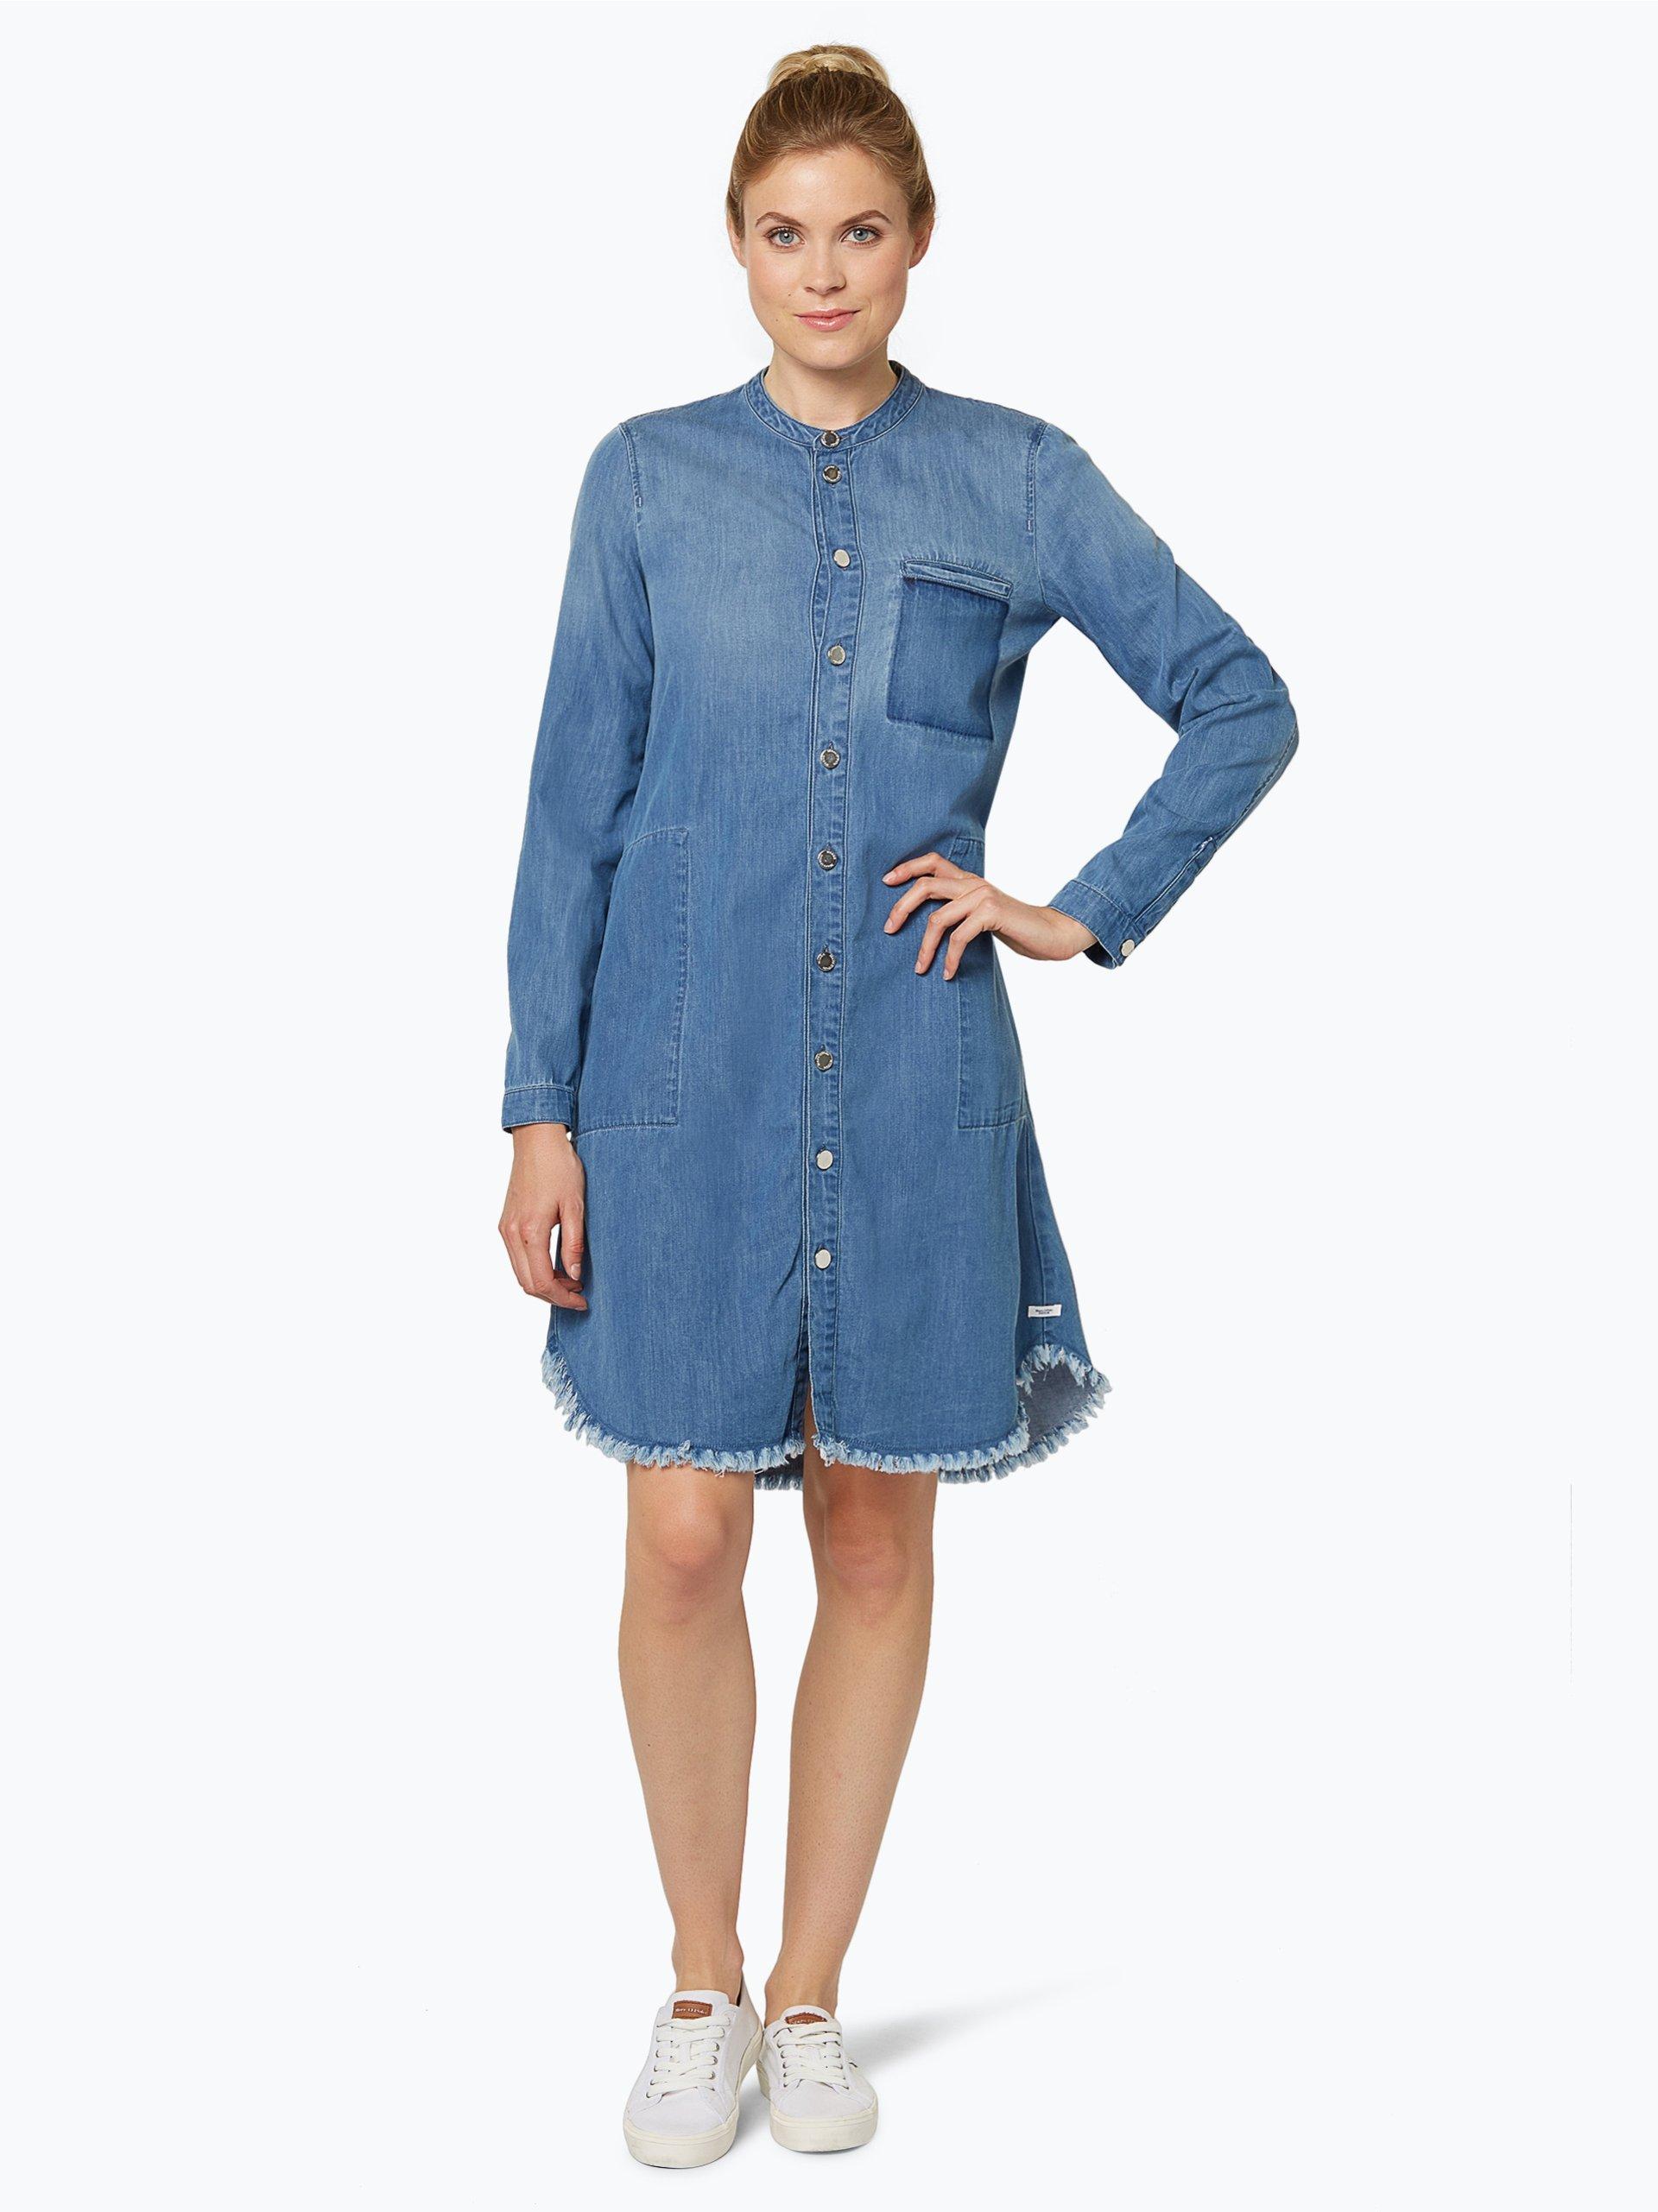 marc o 39 polo denim damen jeanskleid blau uni online kaufen peek und cloppenburg de. Black Bedroom Furniture Sets. Home Design Ideas